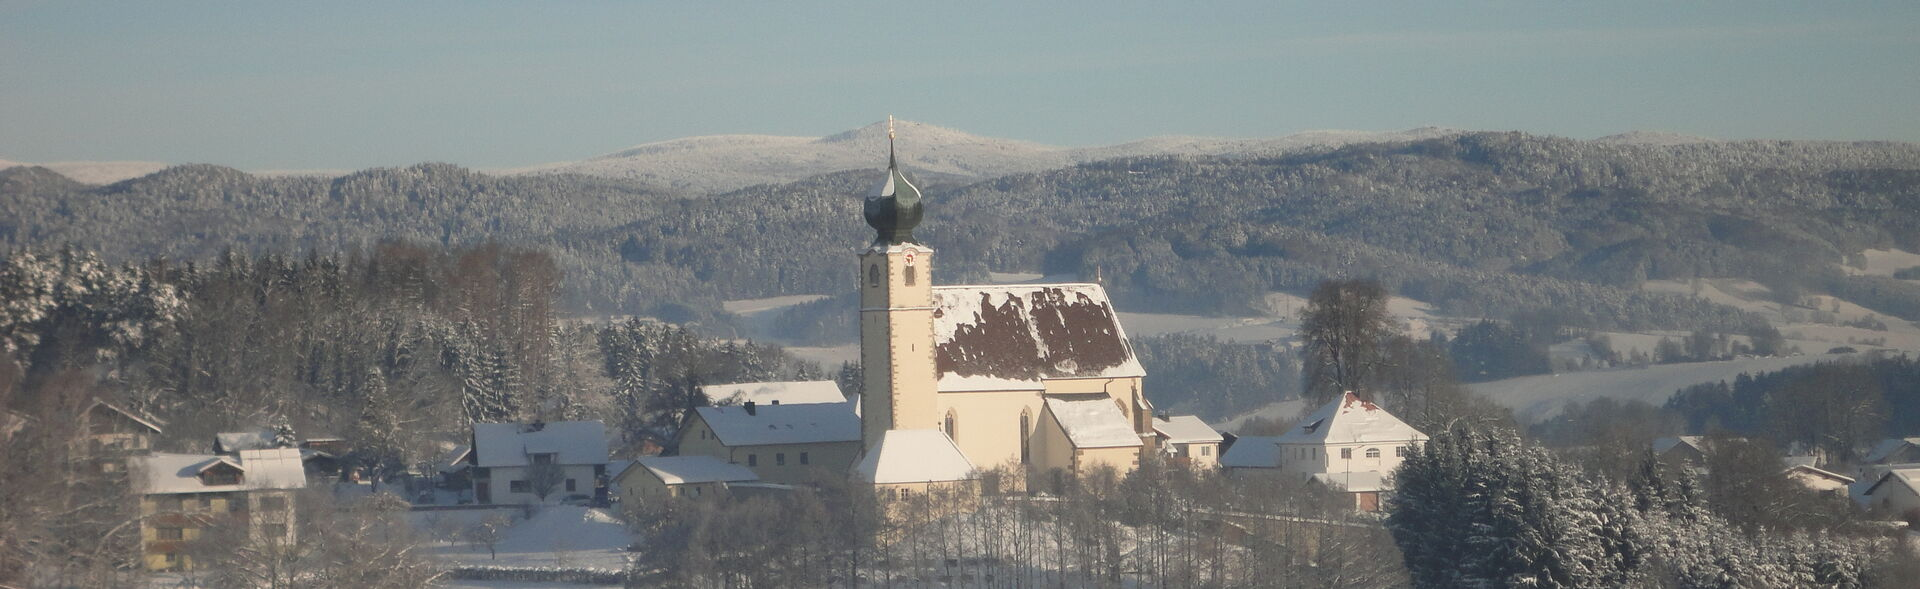 Blick zur Kirche St. Brigida in Preying